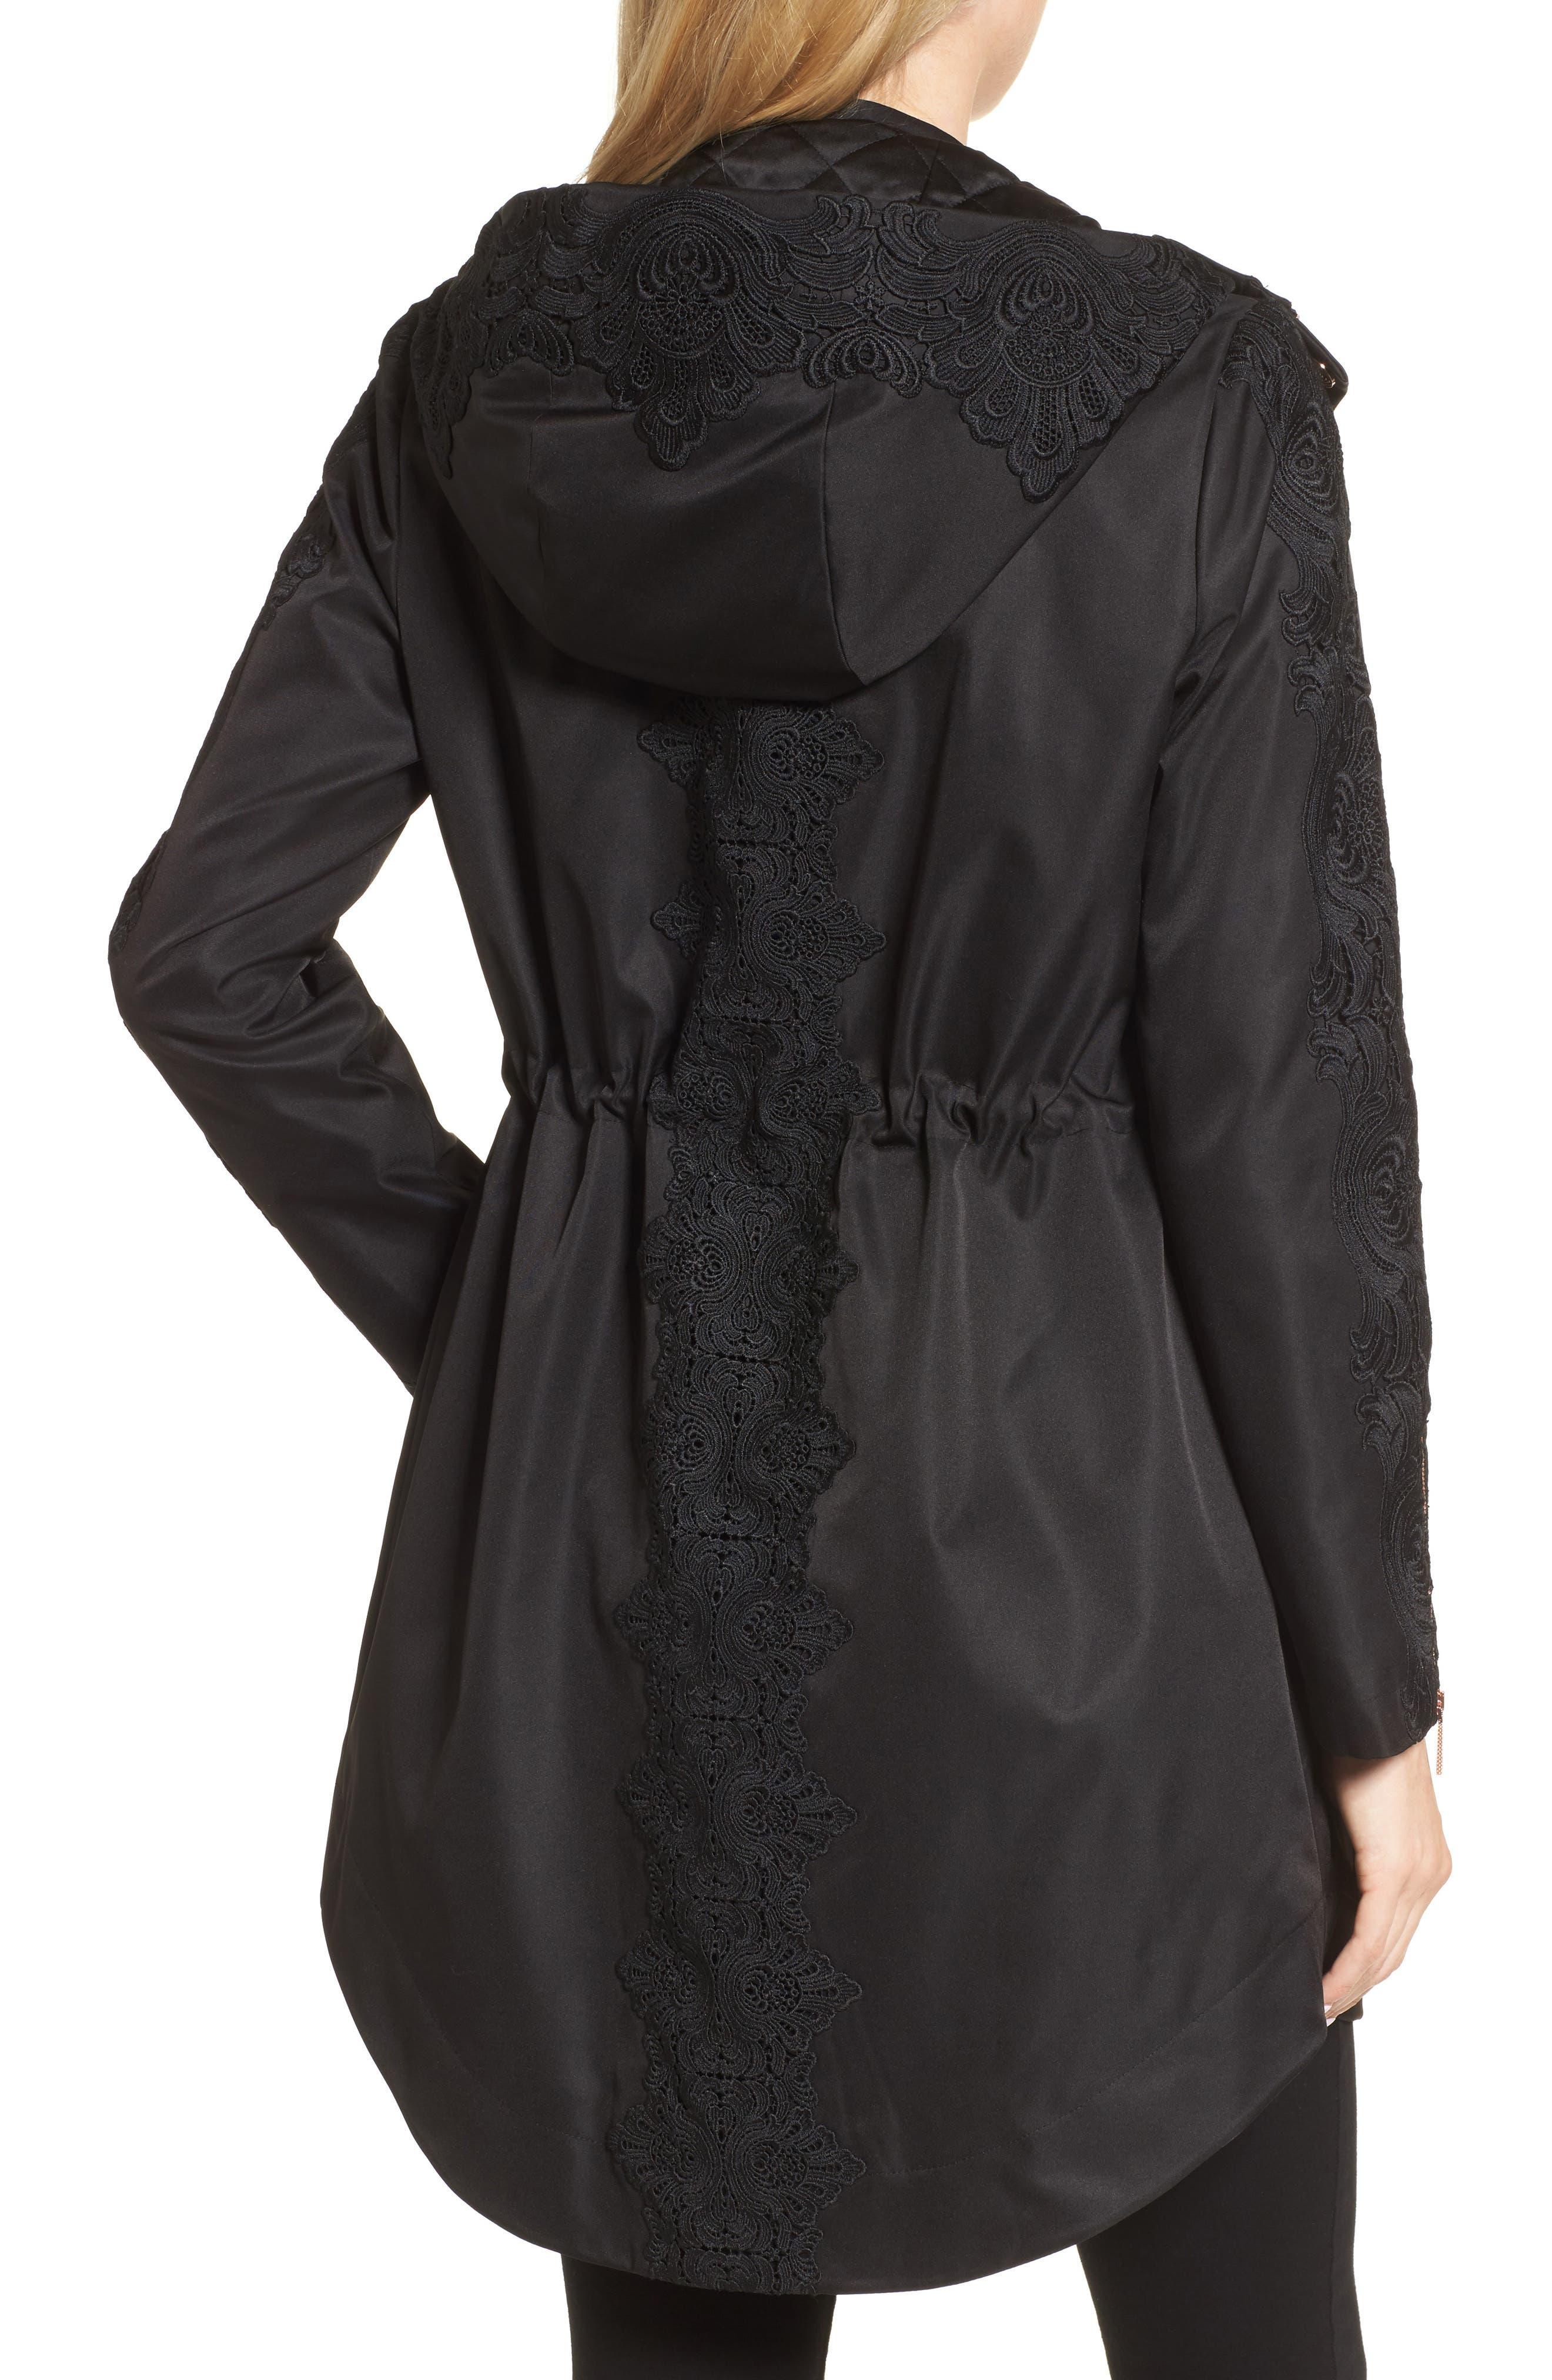 Lace Detail Anorak Jacket,                             Alternate thumbnail 2, color,                             001